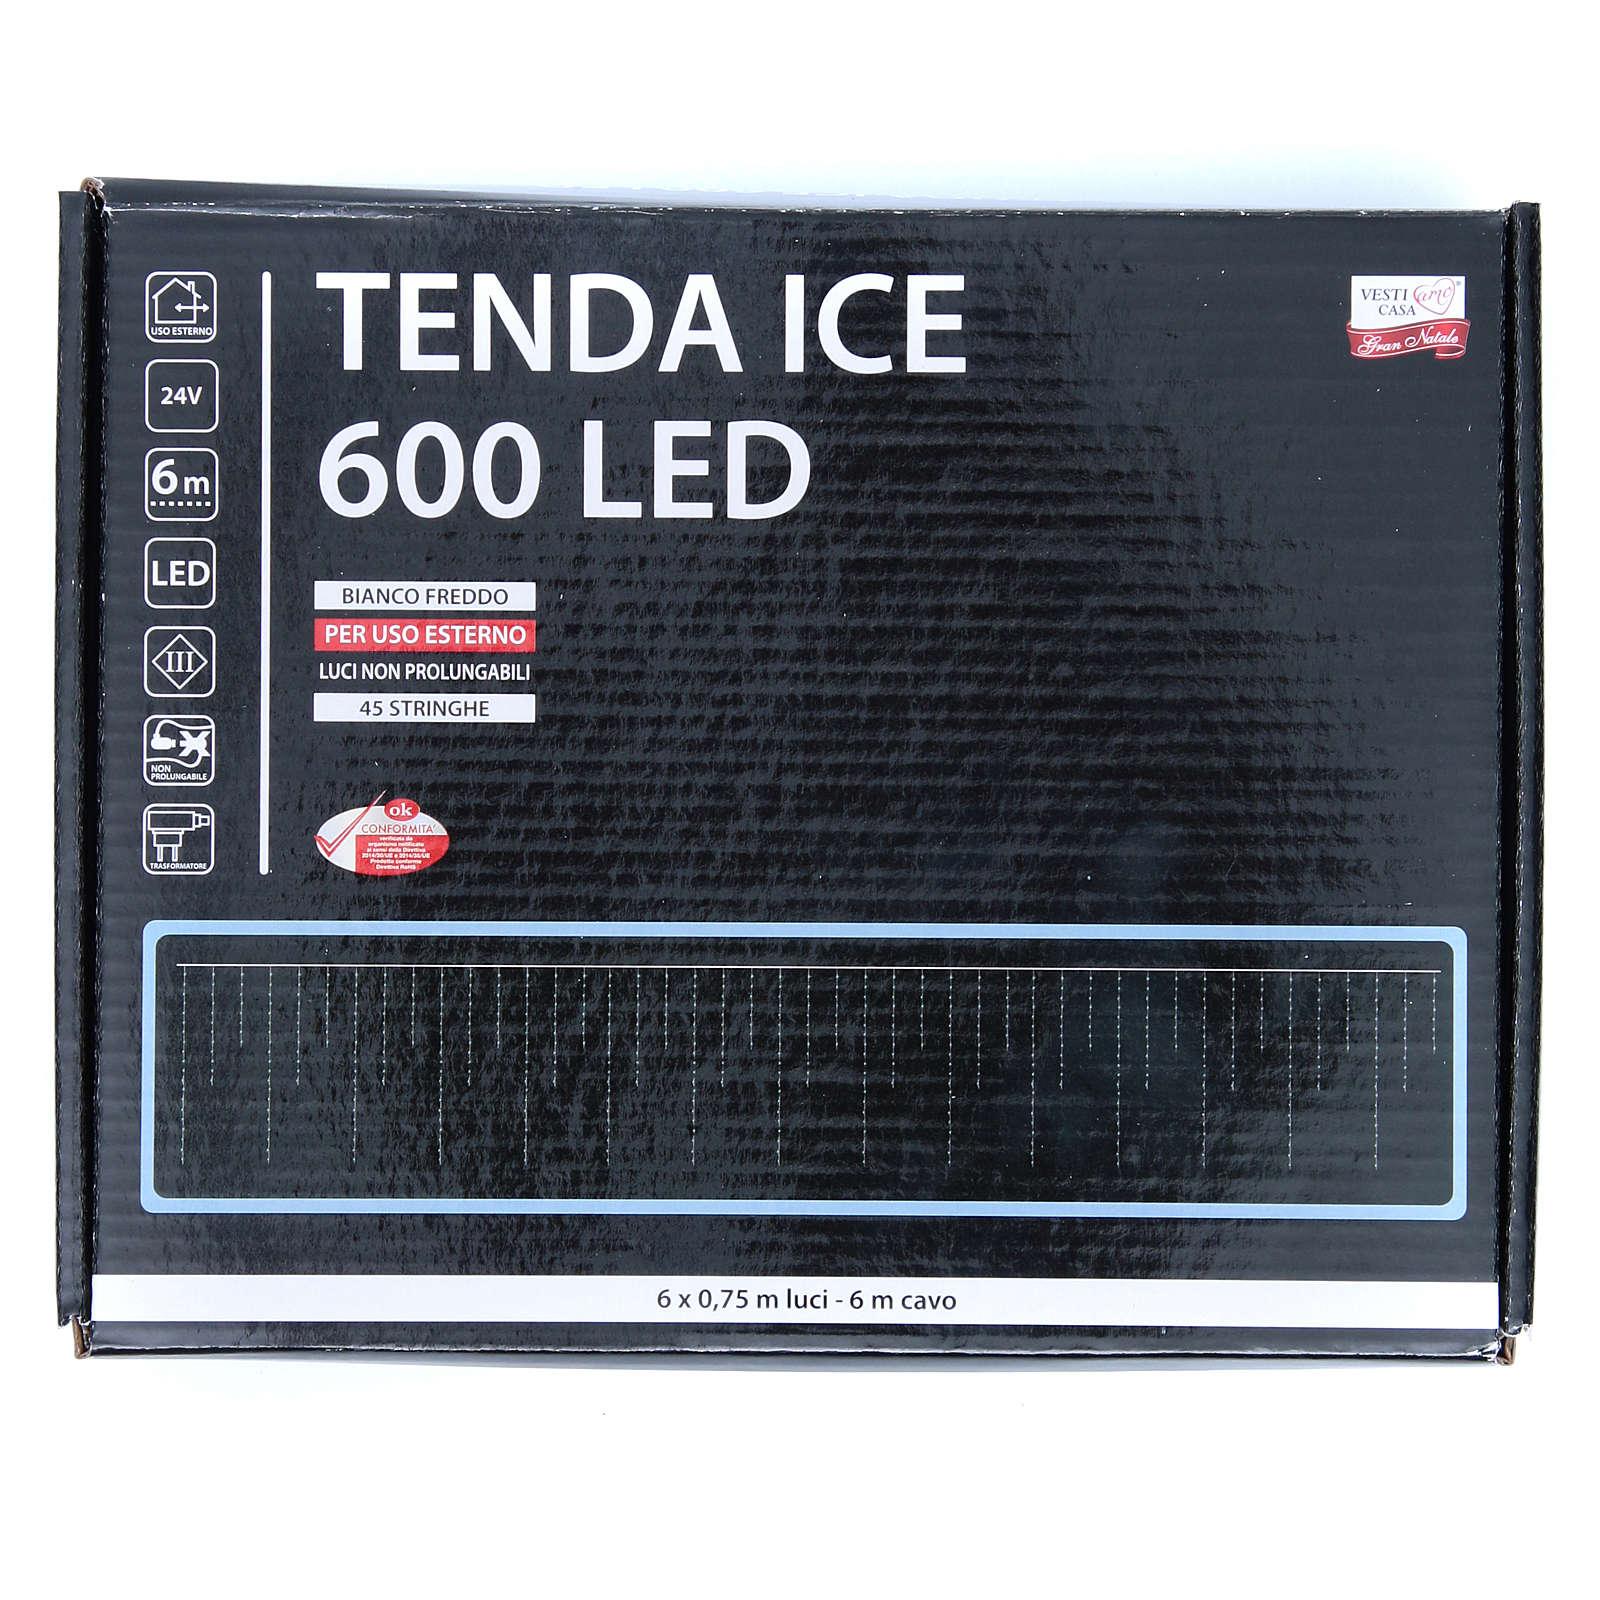 Luce natalizia tenda ICE 600 led bianco freddo ESTERNO 3